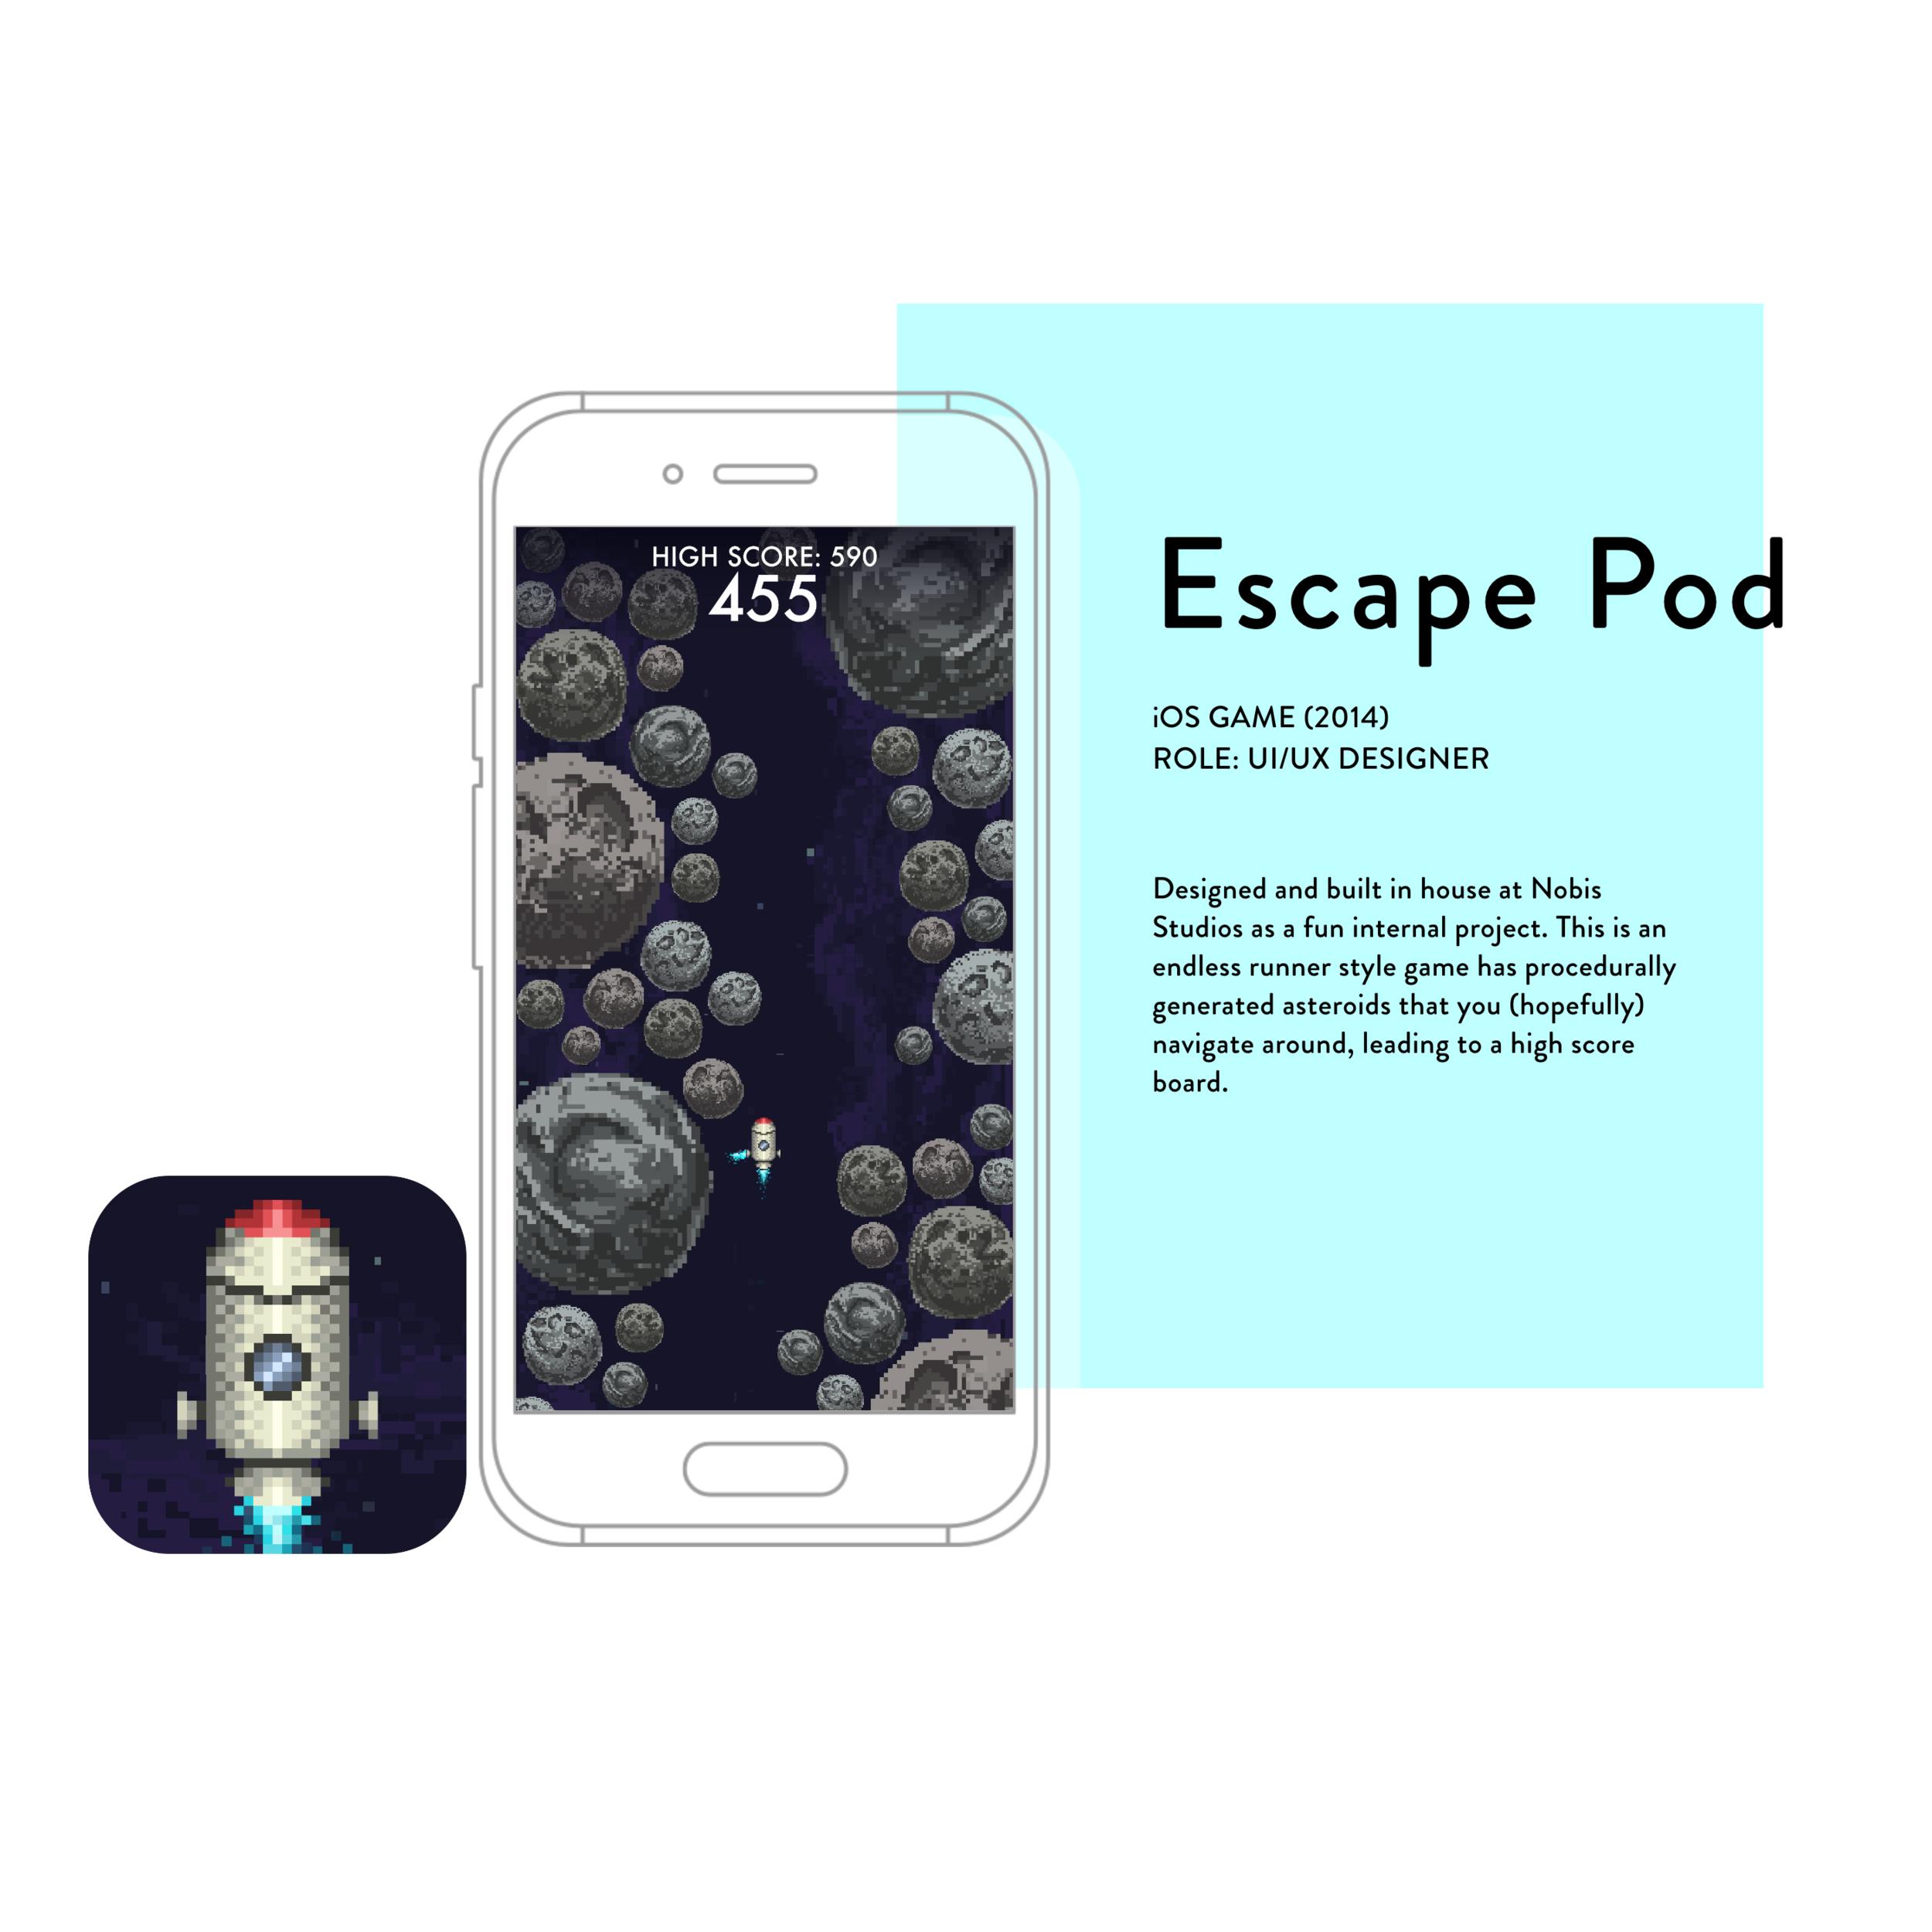 EscapePod@2x.png